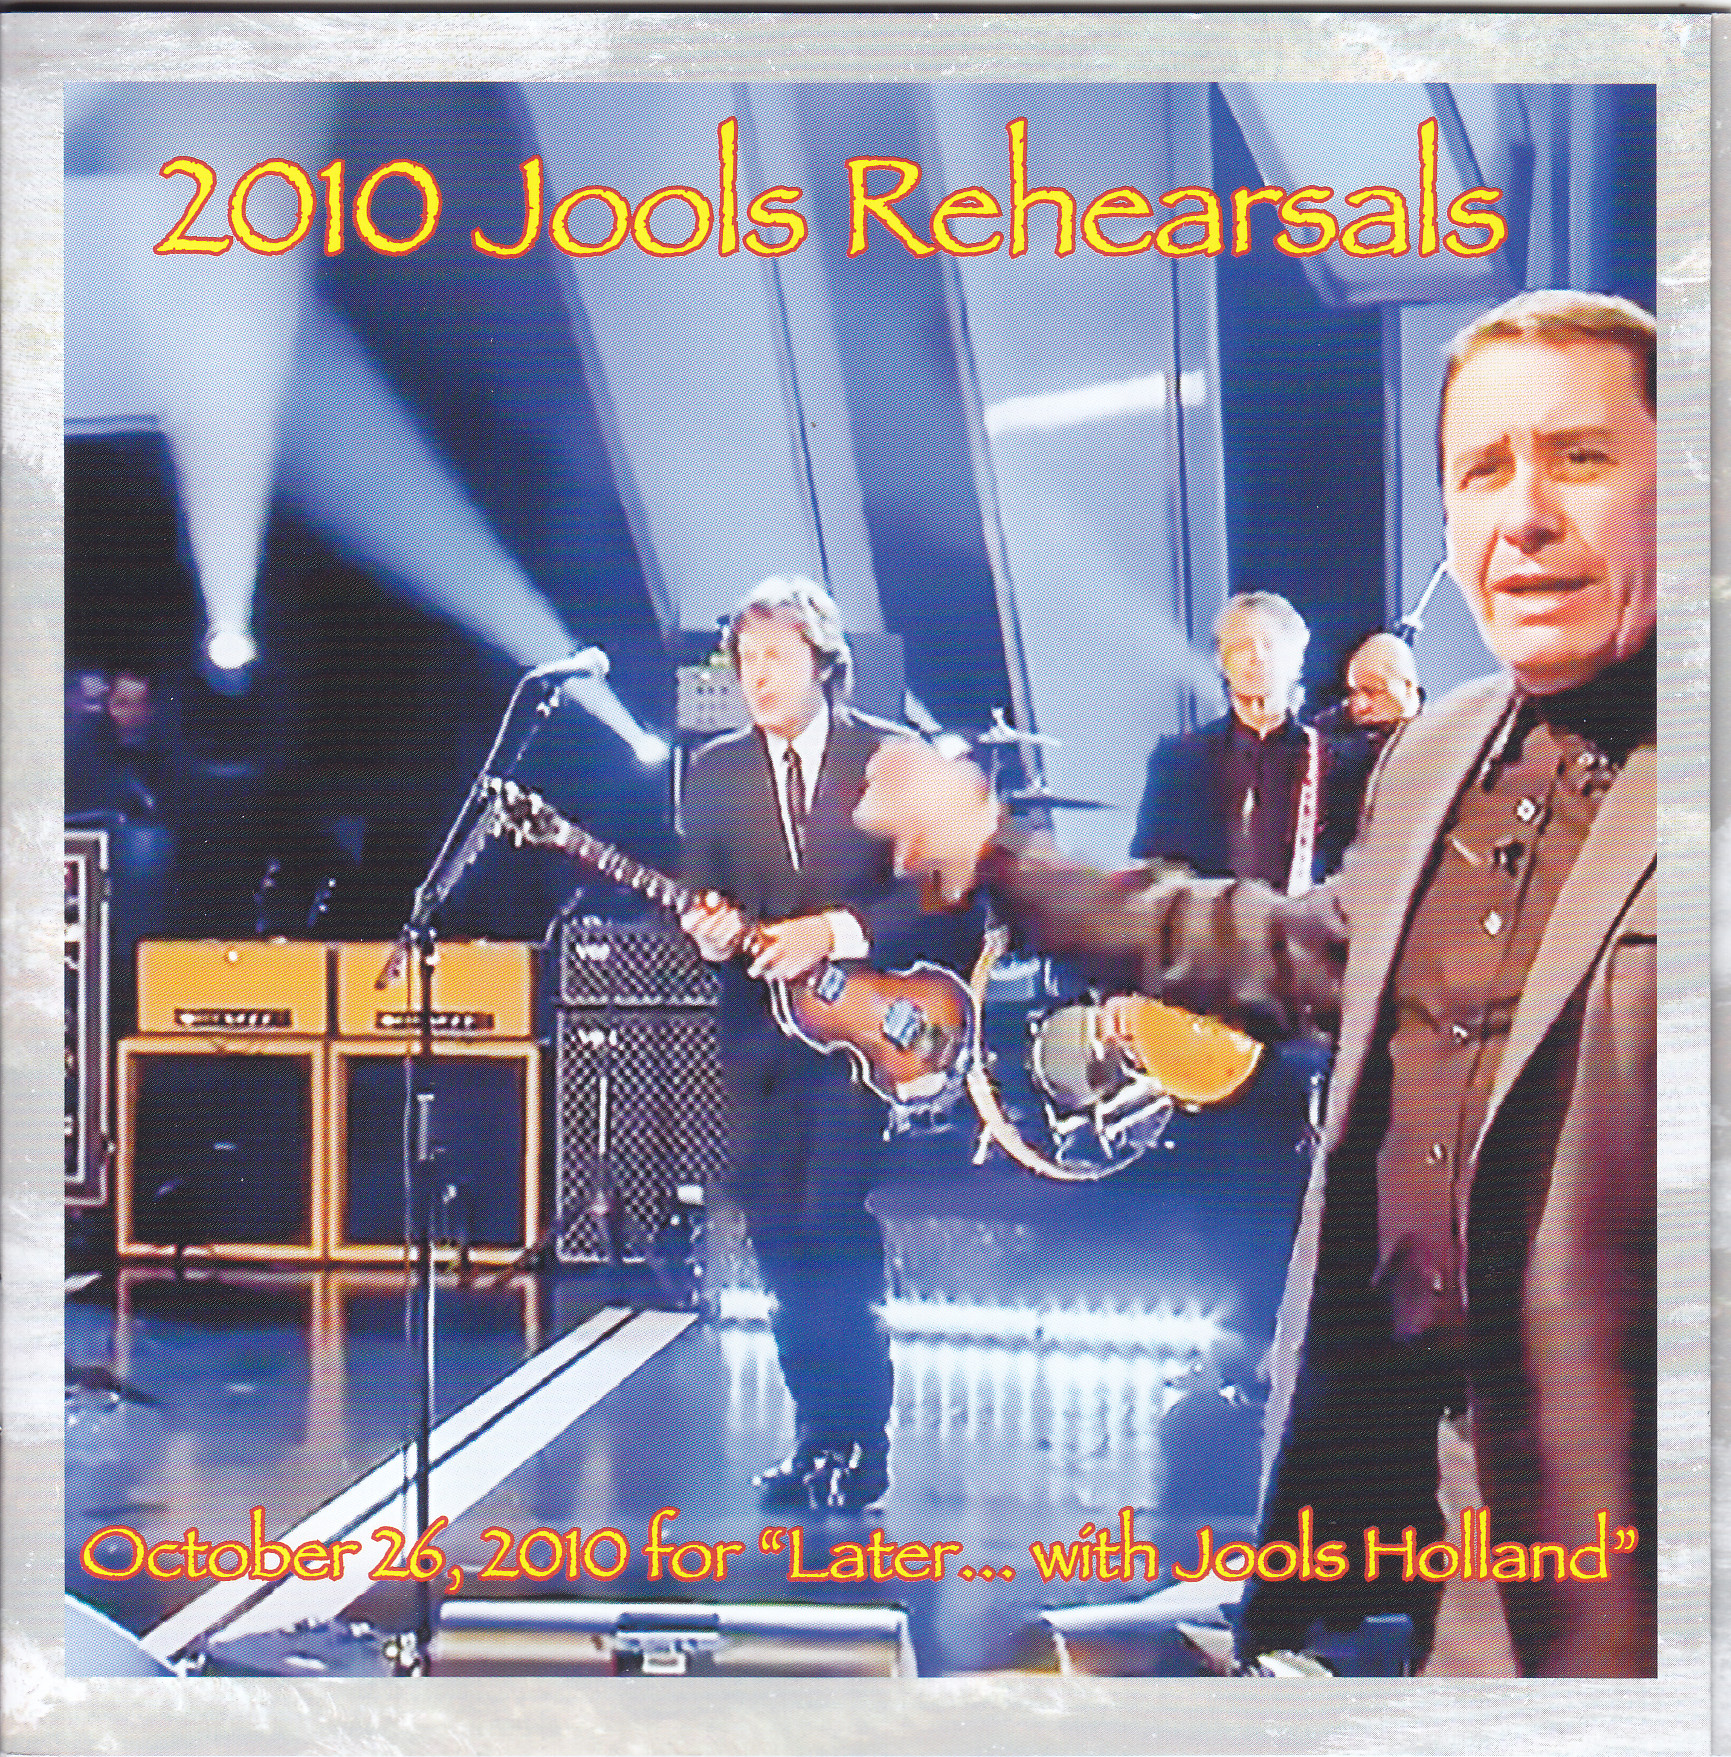 Paulmcc 2010 Jools Rehearsals1